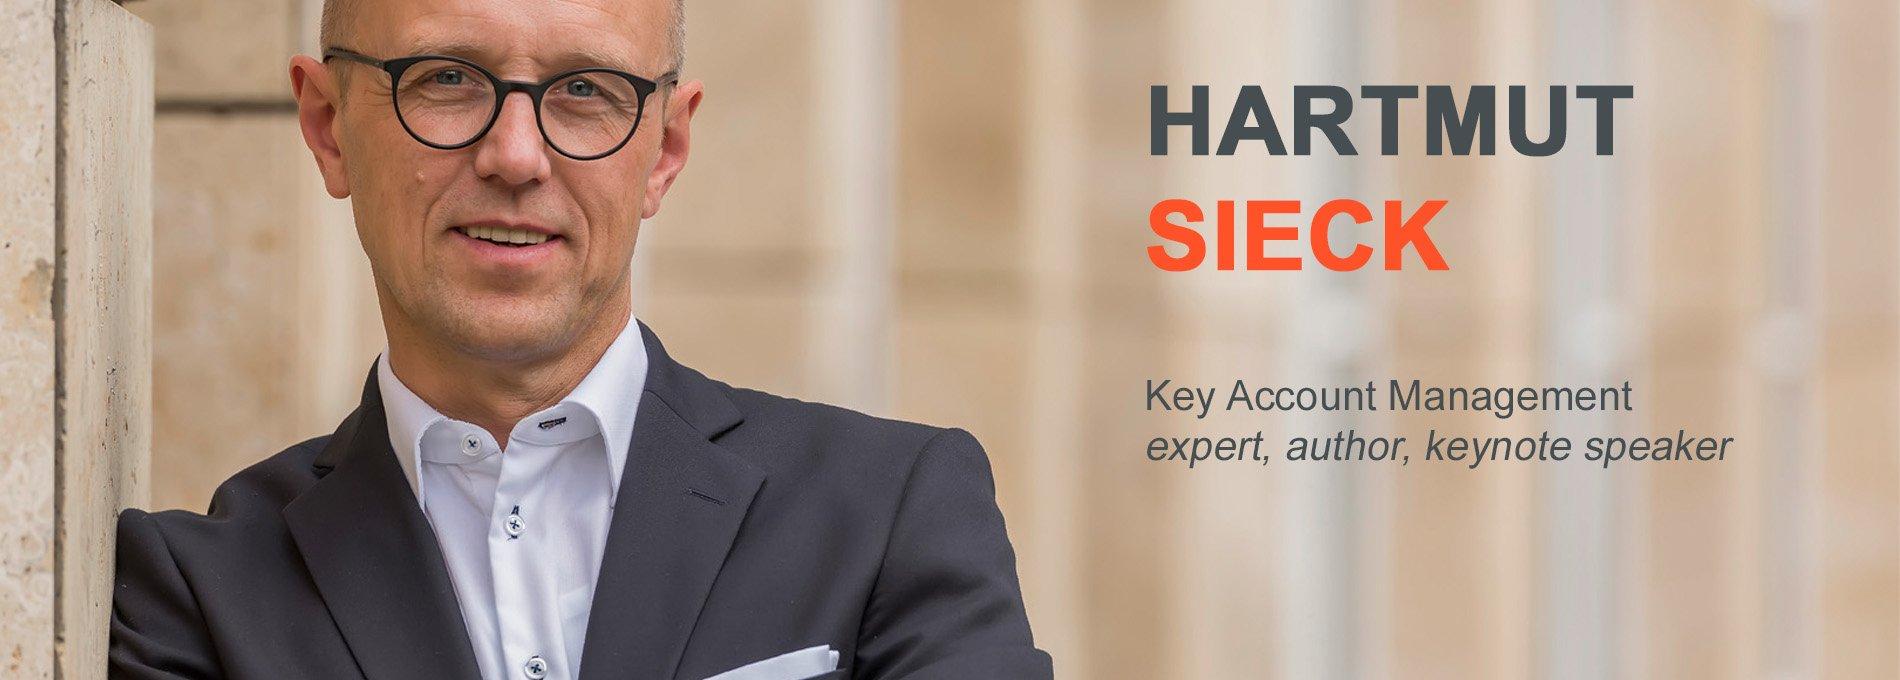 Hartmut Sieck - Key Account Management business consultant, keynote speaker, author